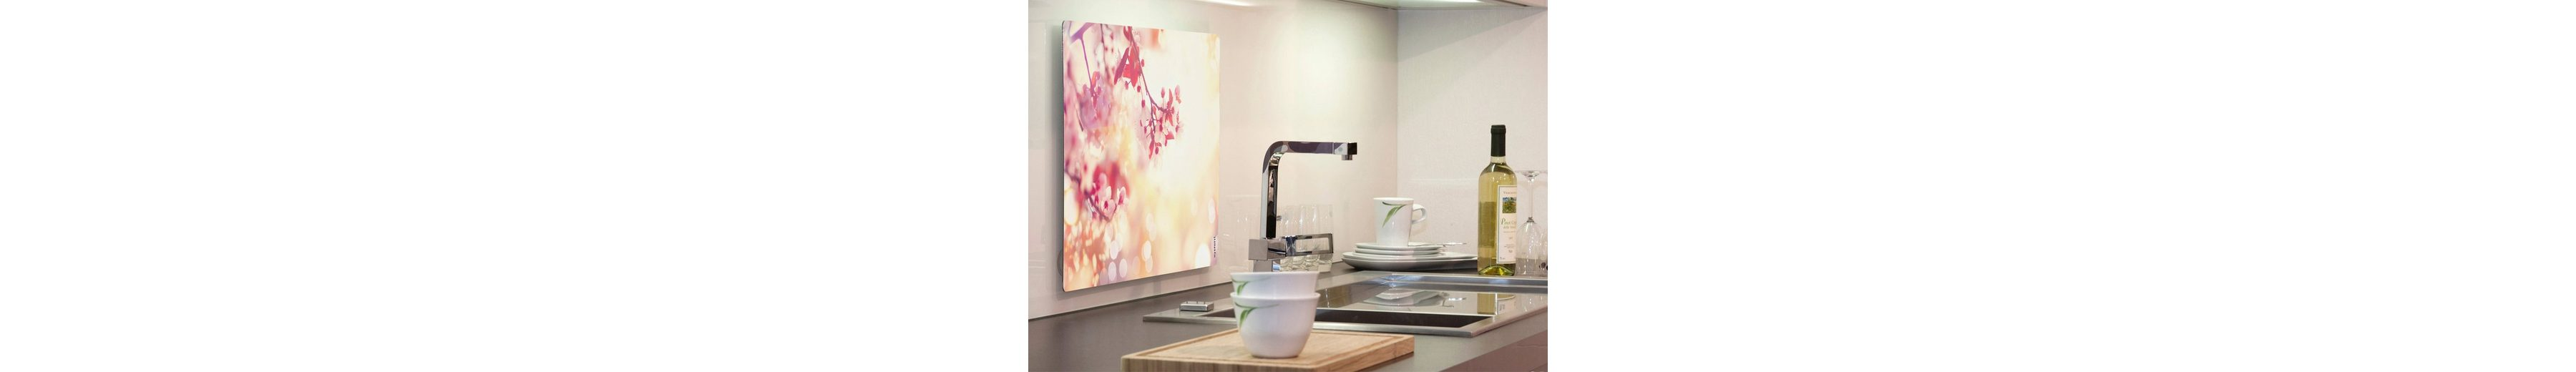 Küchenrückwand »pop«, Blütentraum, 59x41 cm